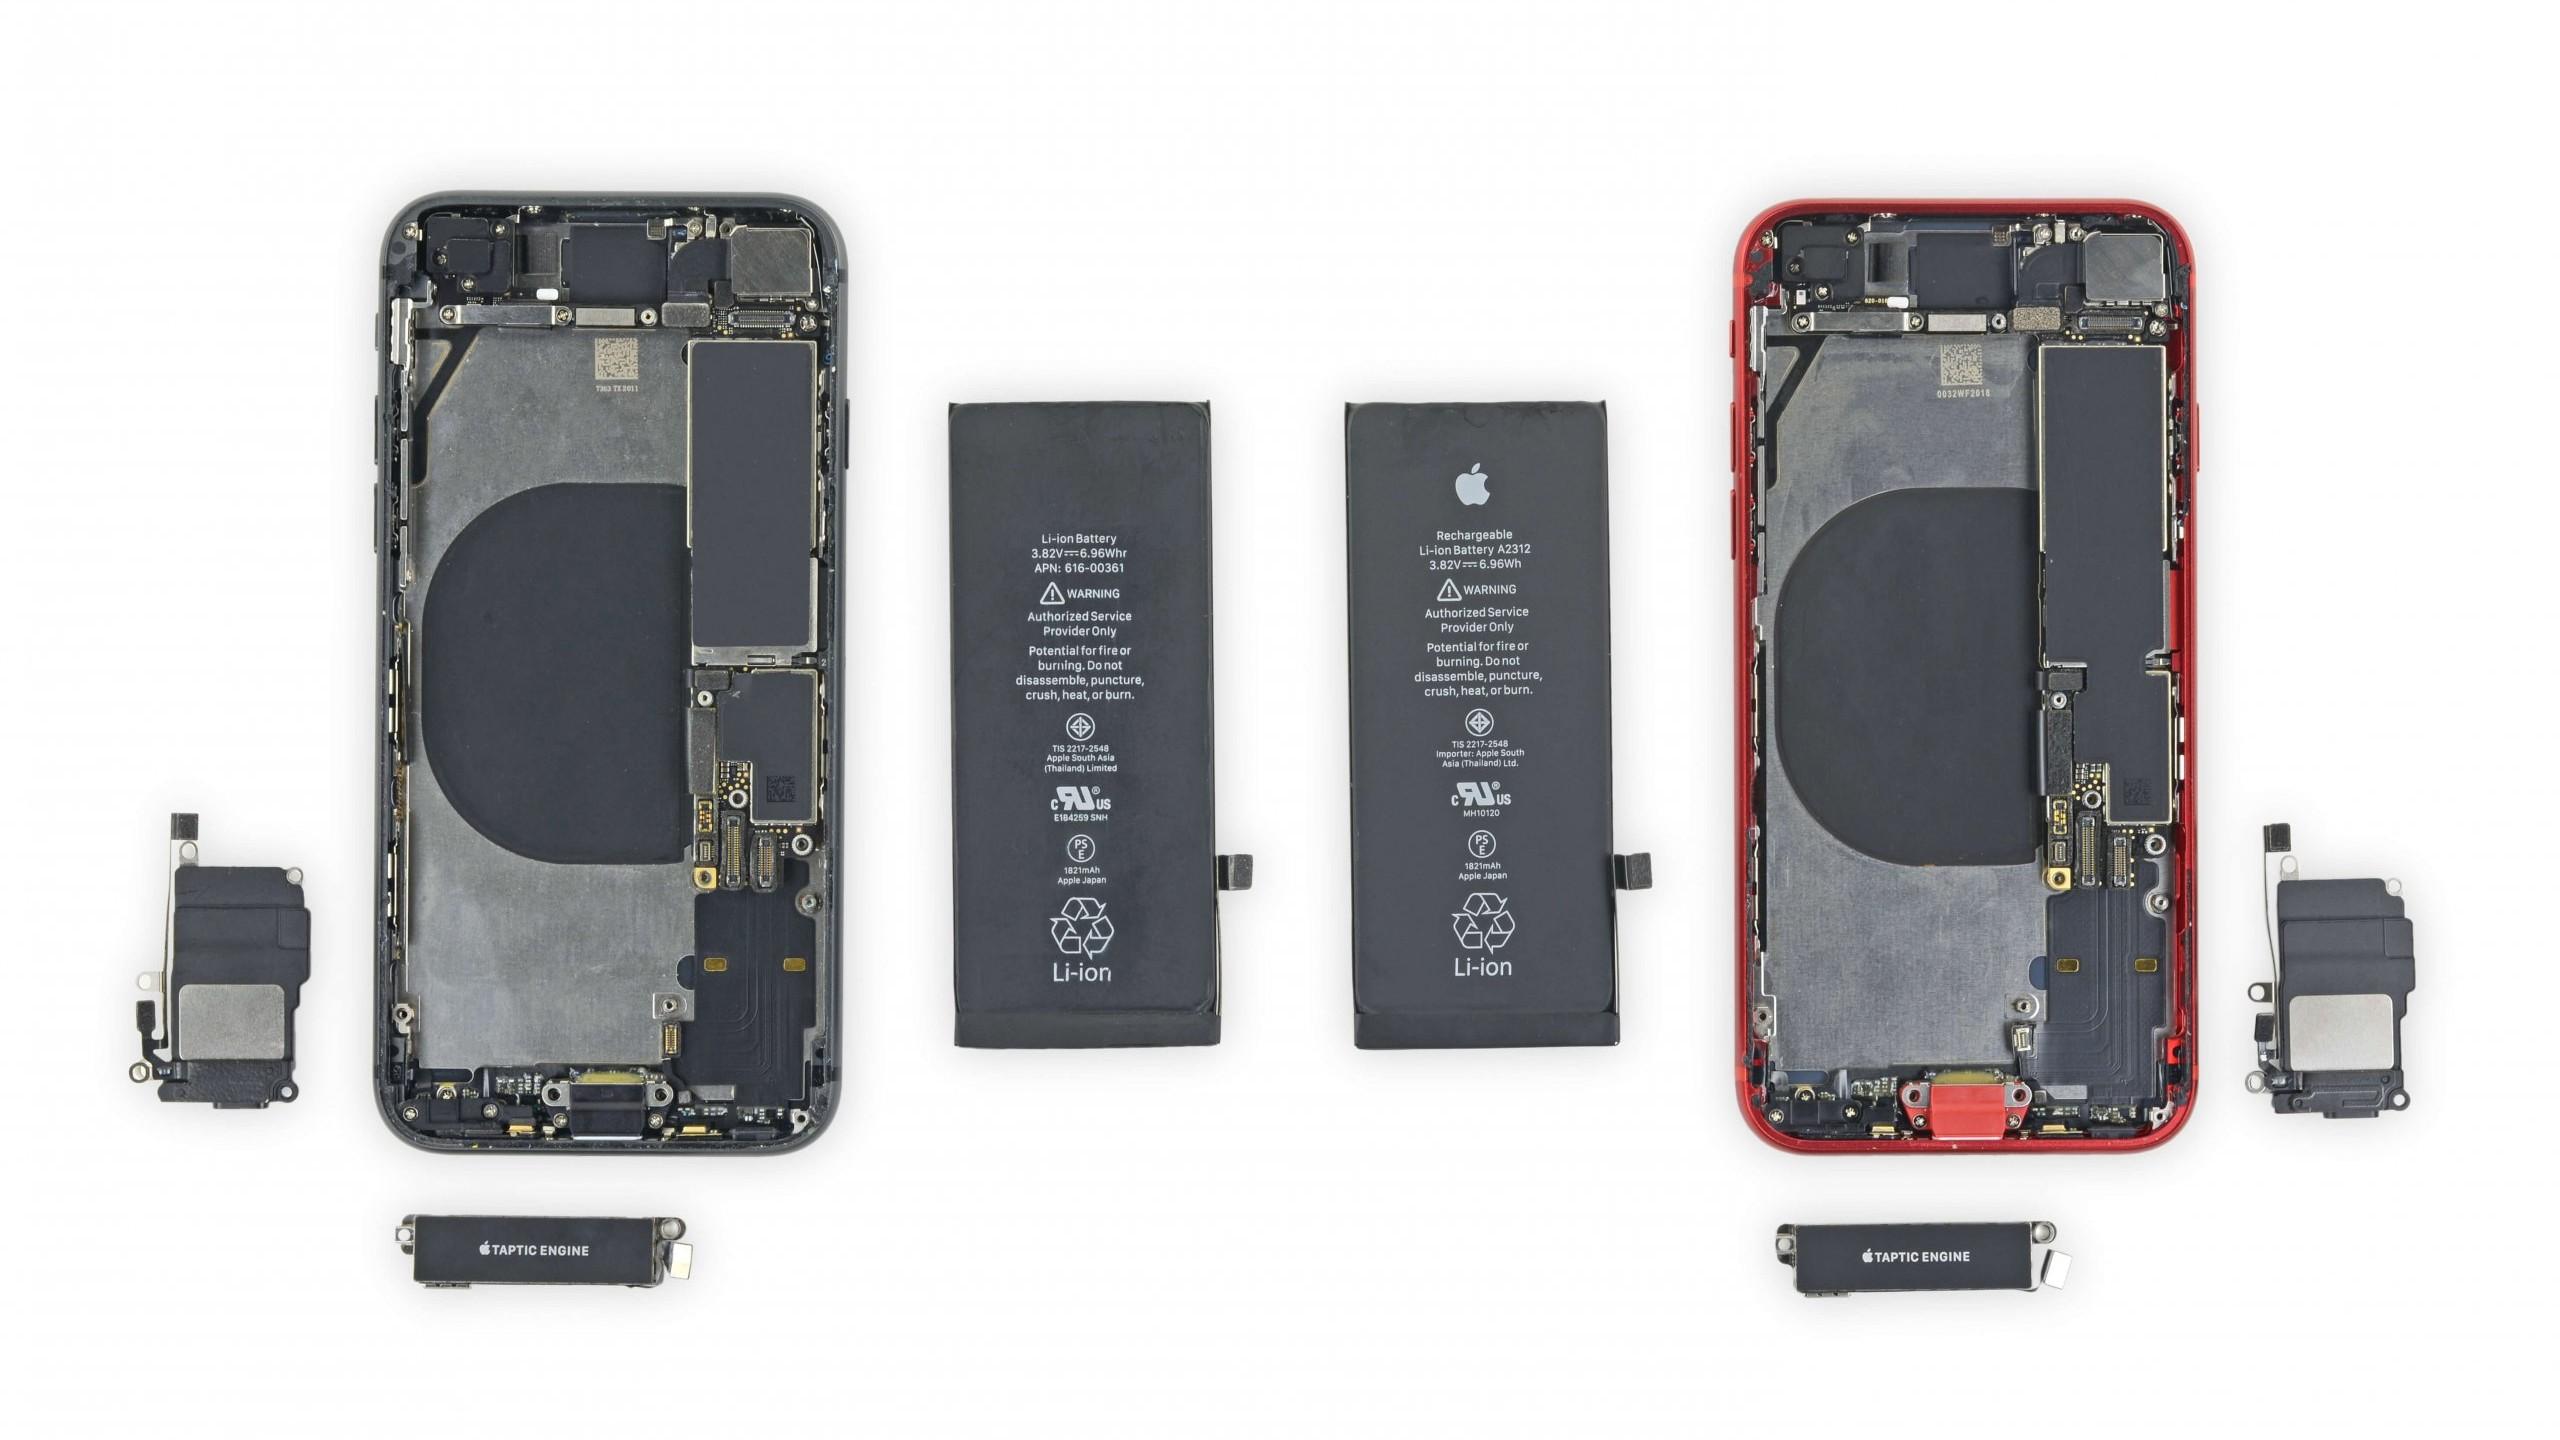 iphone SE 2020 iFixit